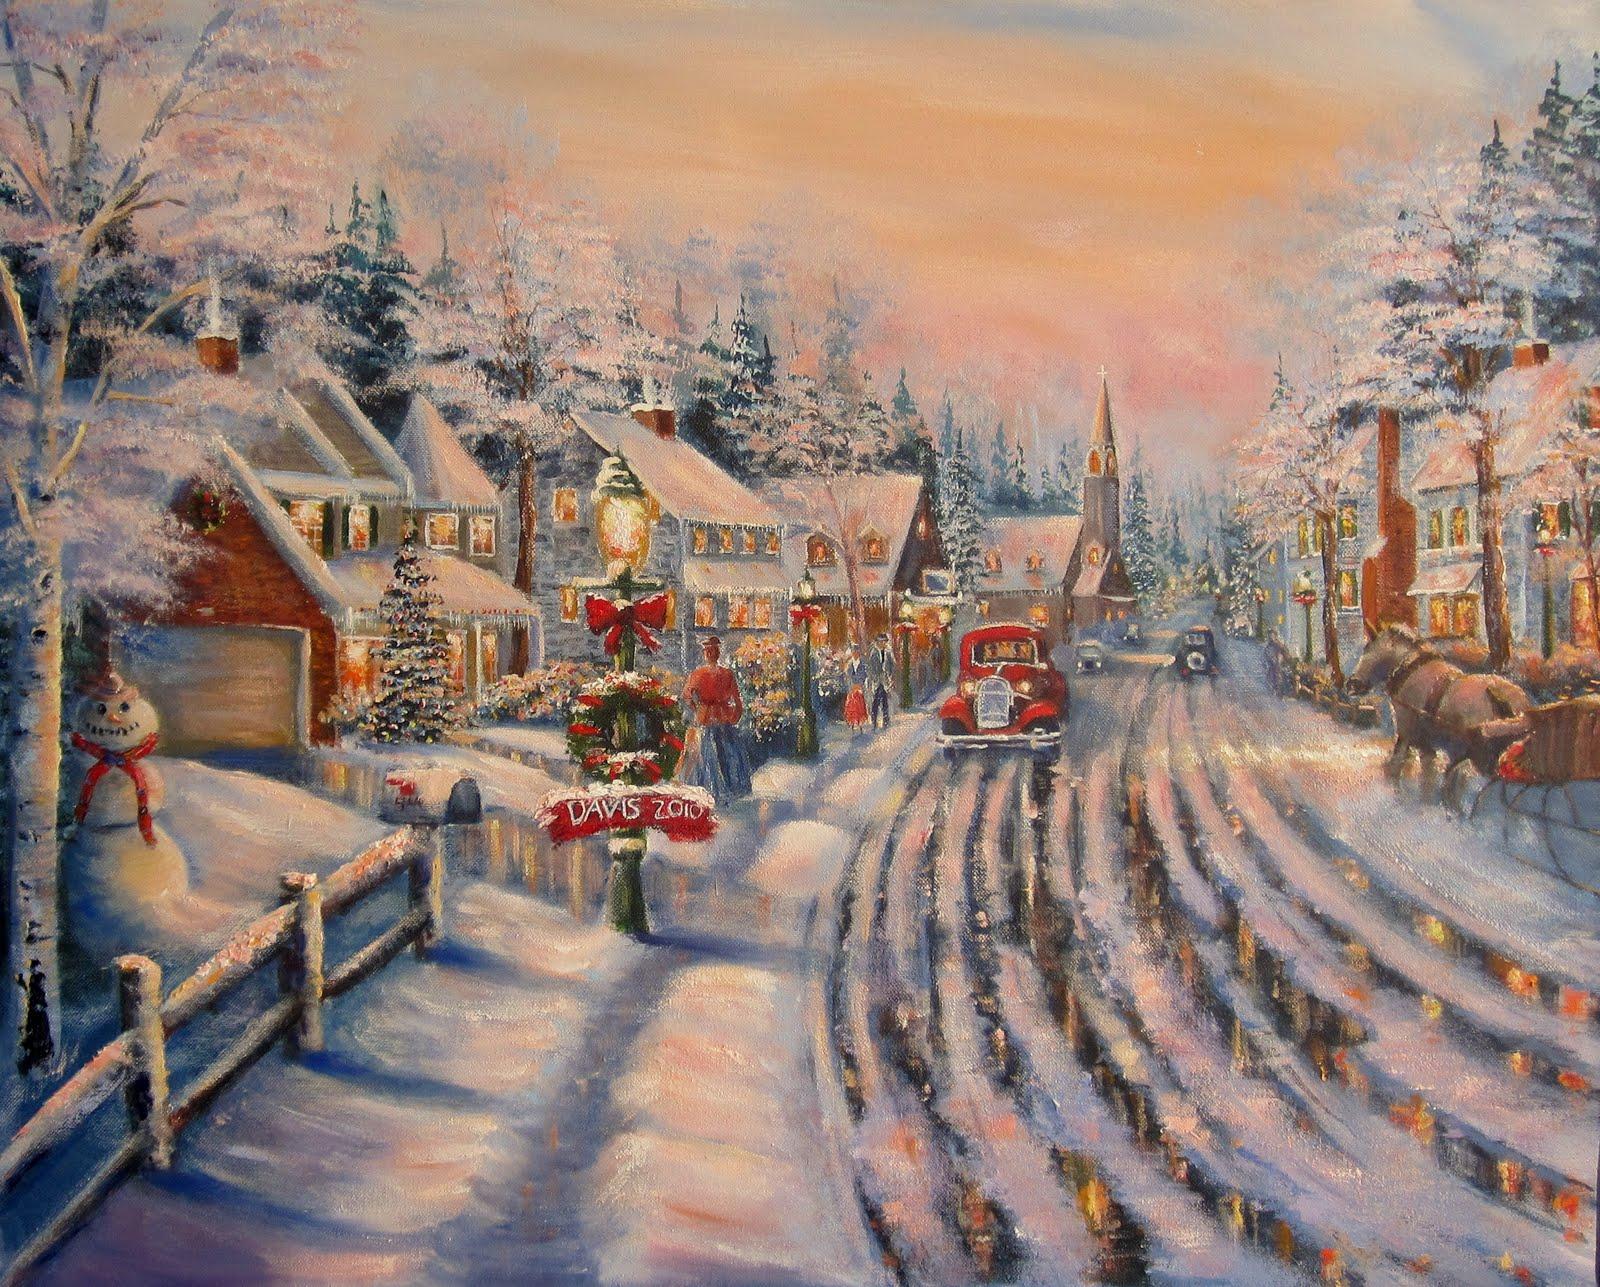 Hd Christmas Wallpapers 1080p Christmas Art Wallpapers High Quality Download Free